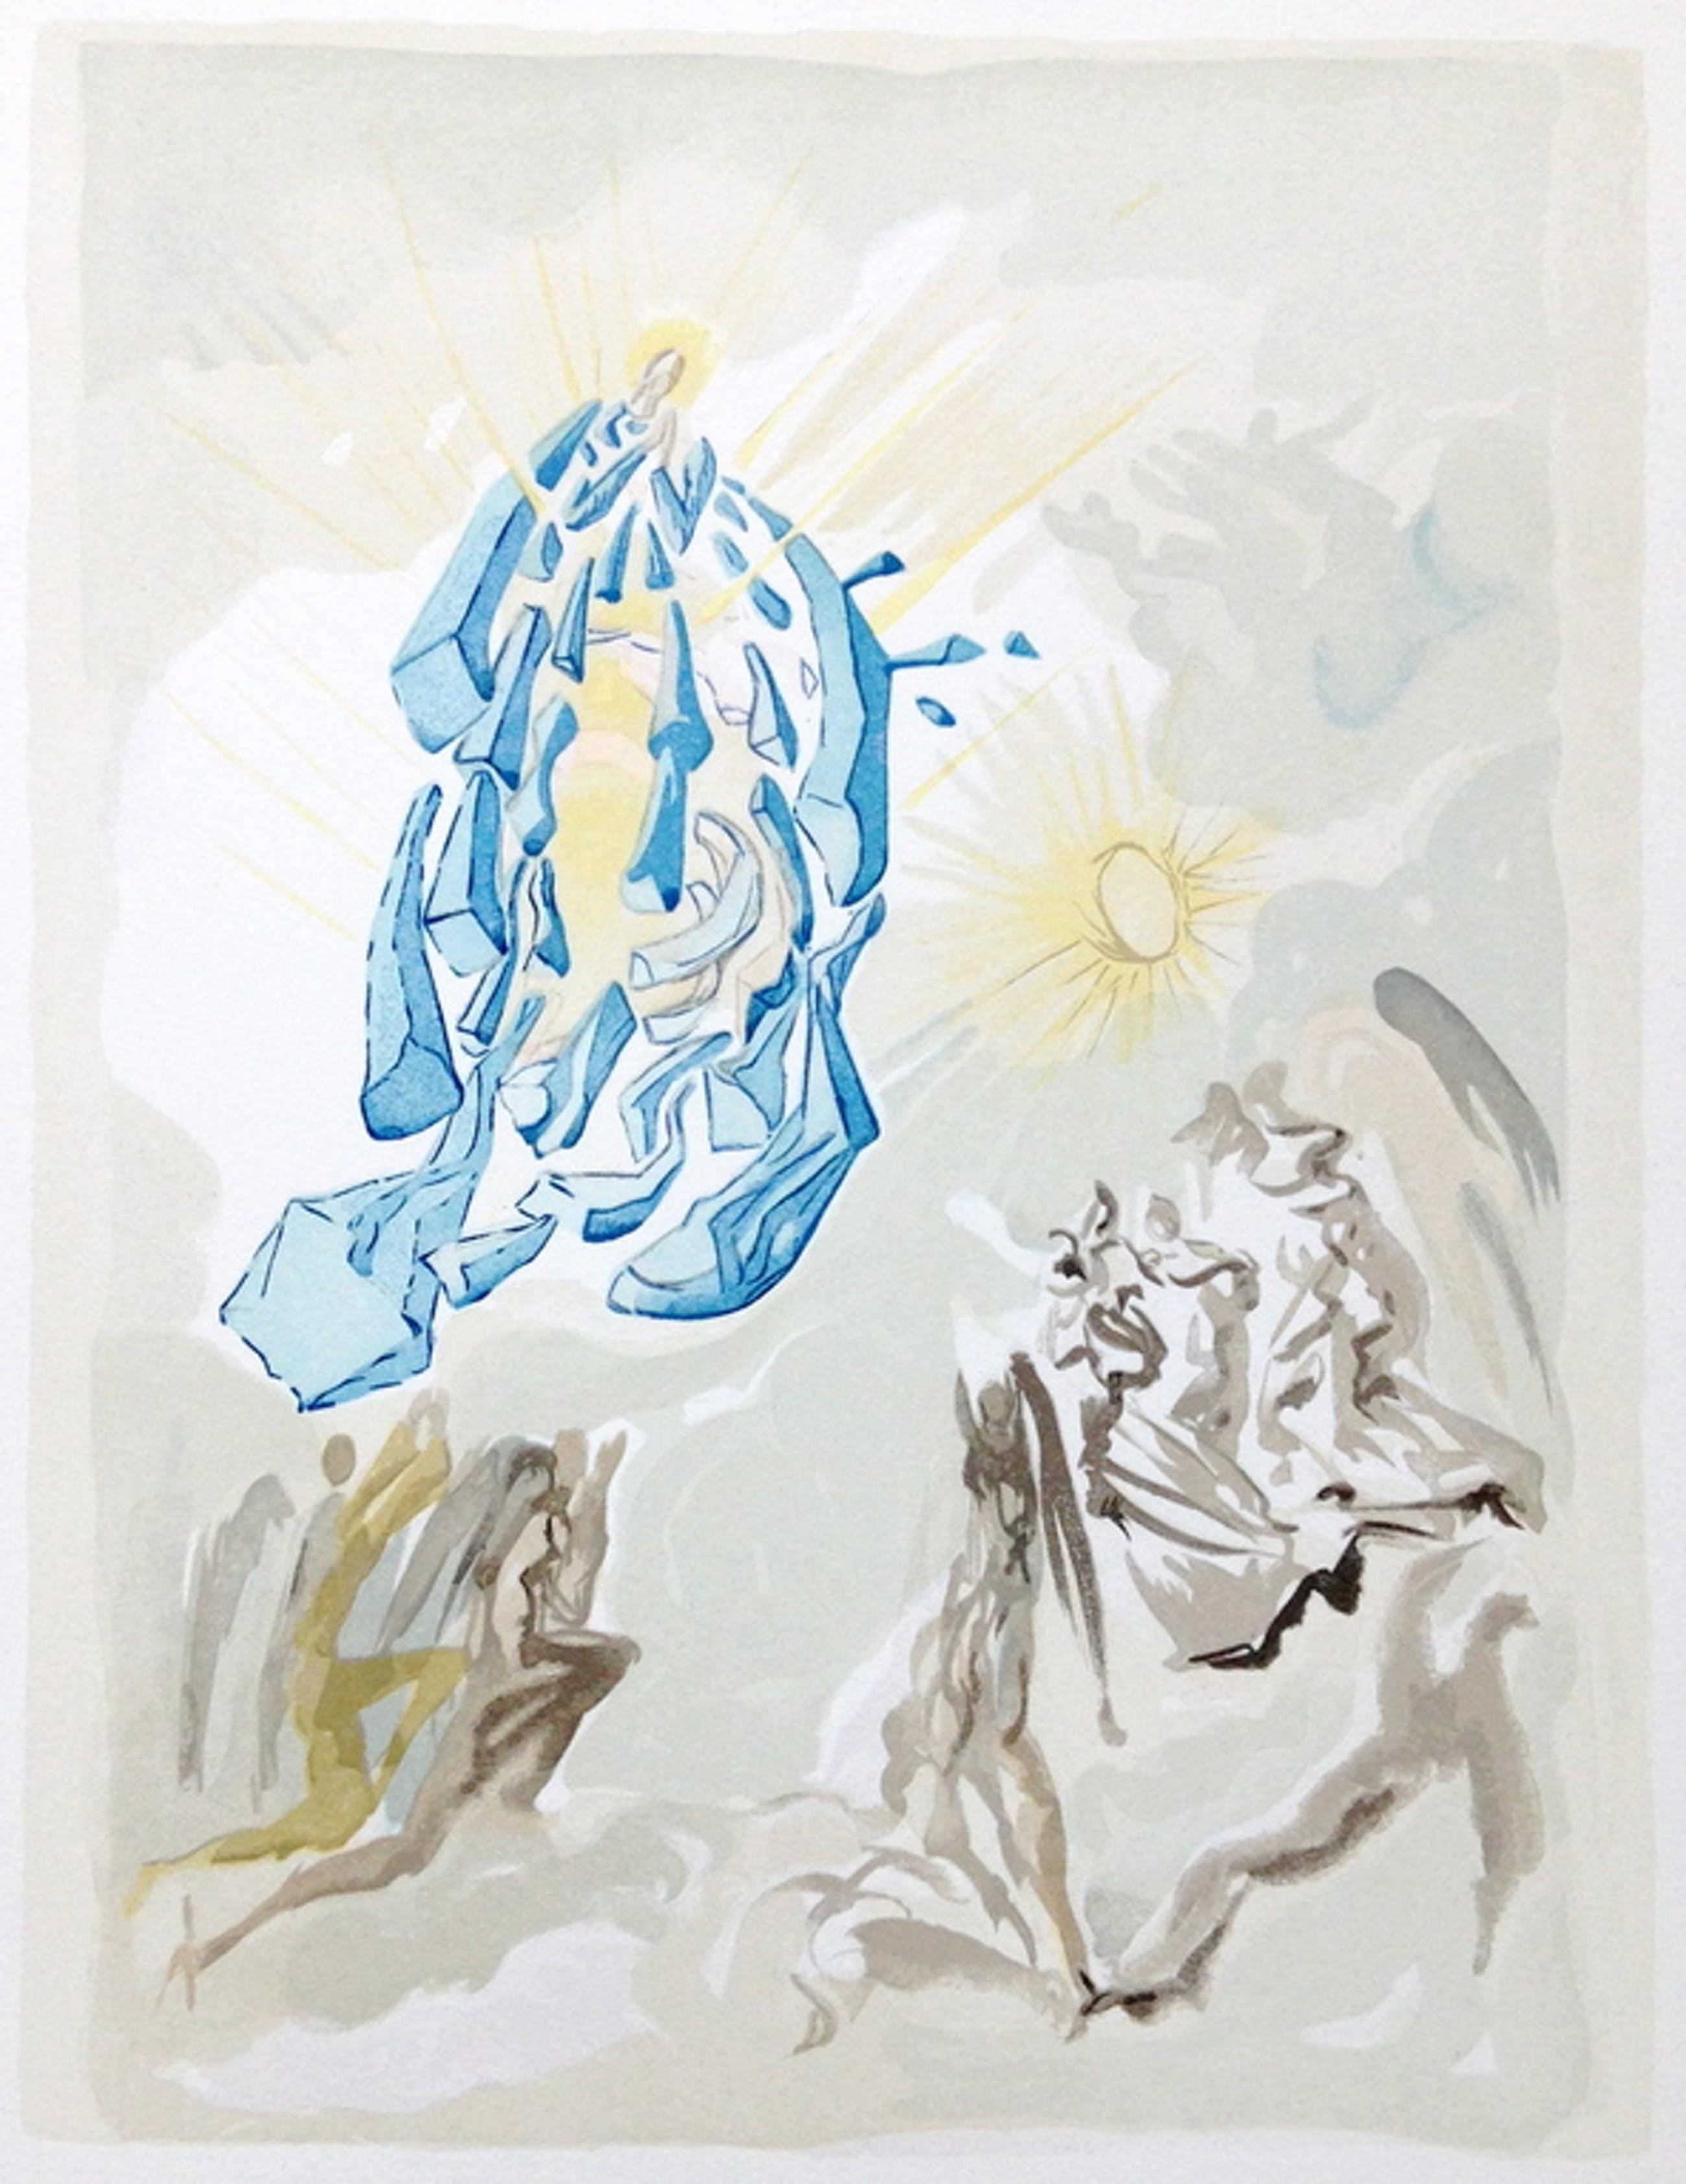 Salvador Dali, ORIGINELE HOUTGRAVURE, 'Dante recouvre la vue' kopen? Bied vanaf 175!